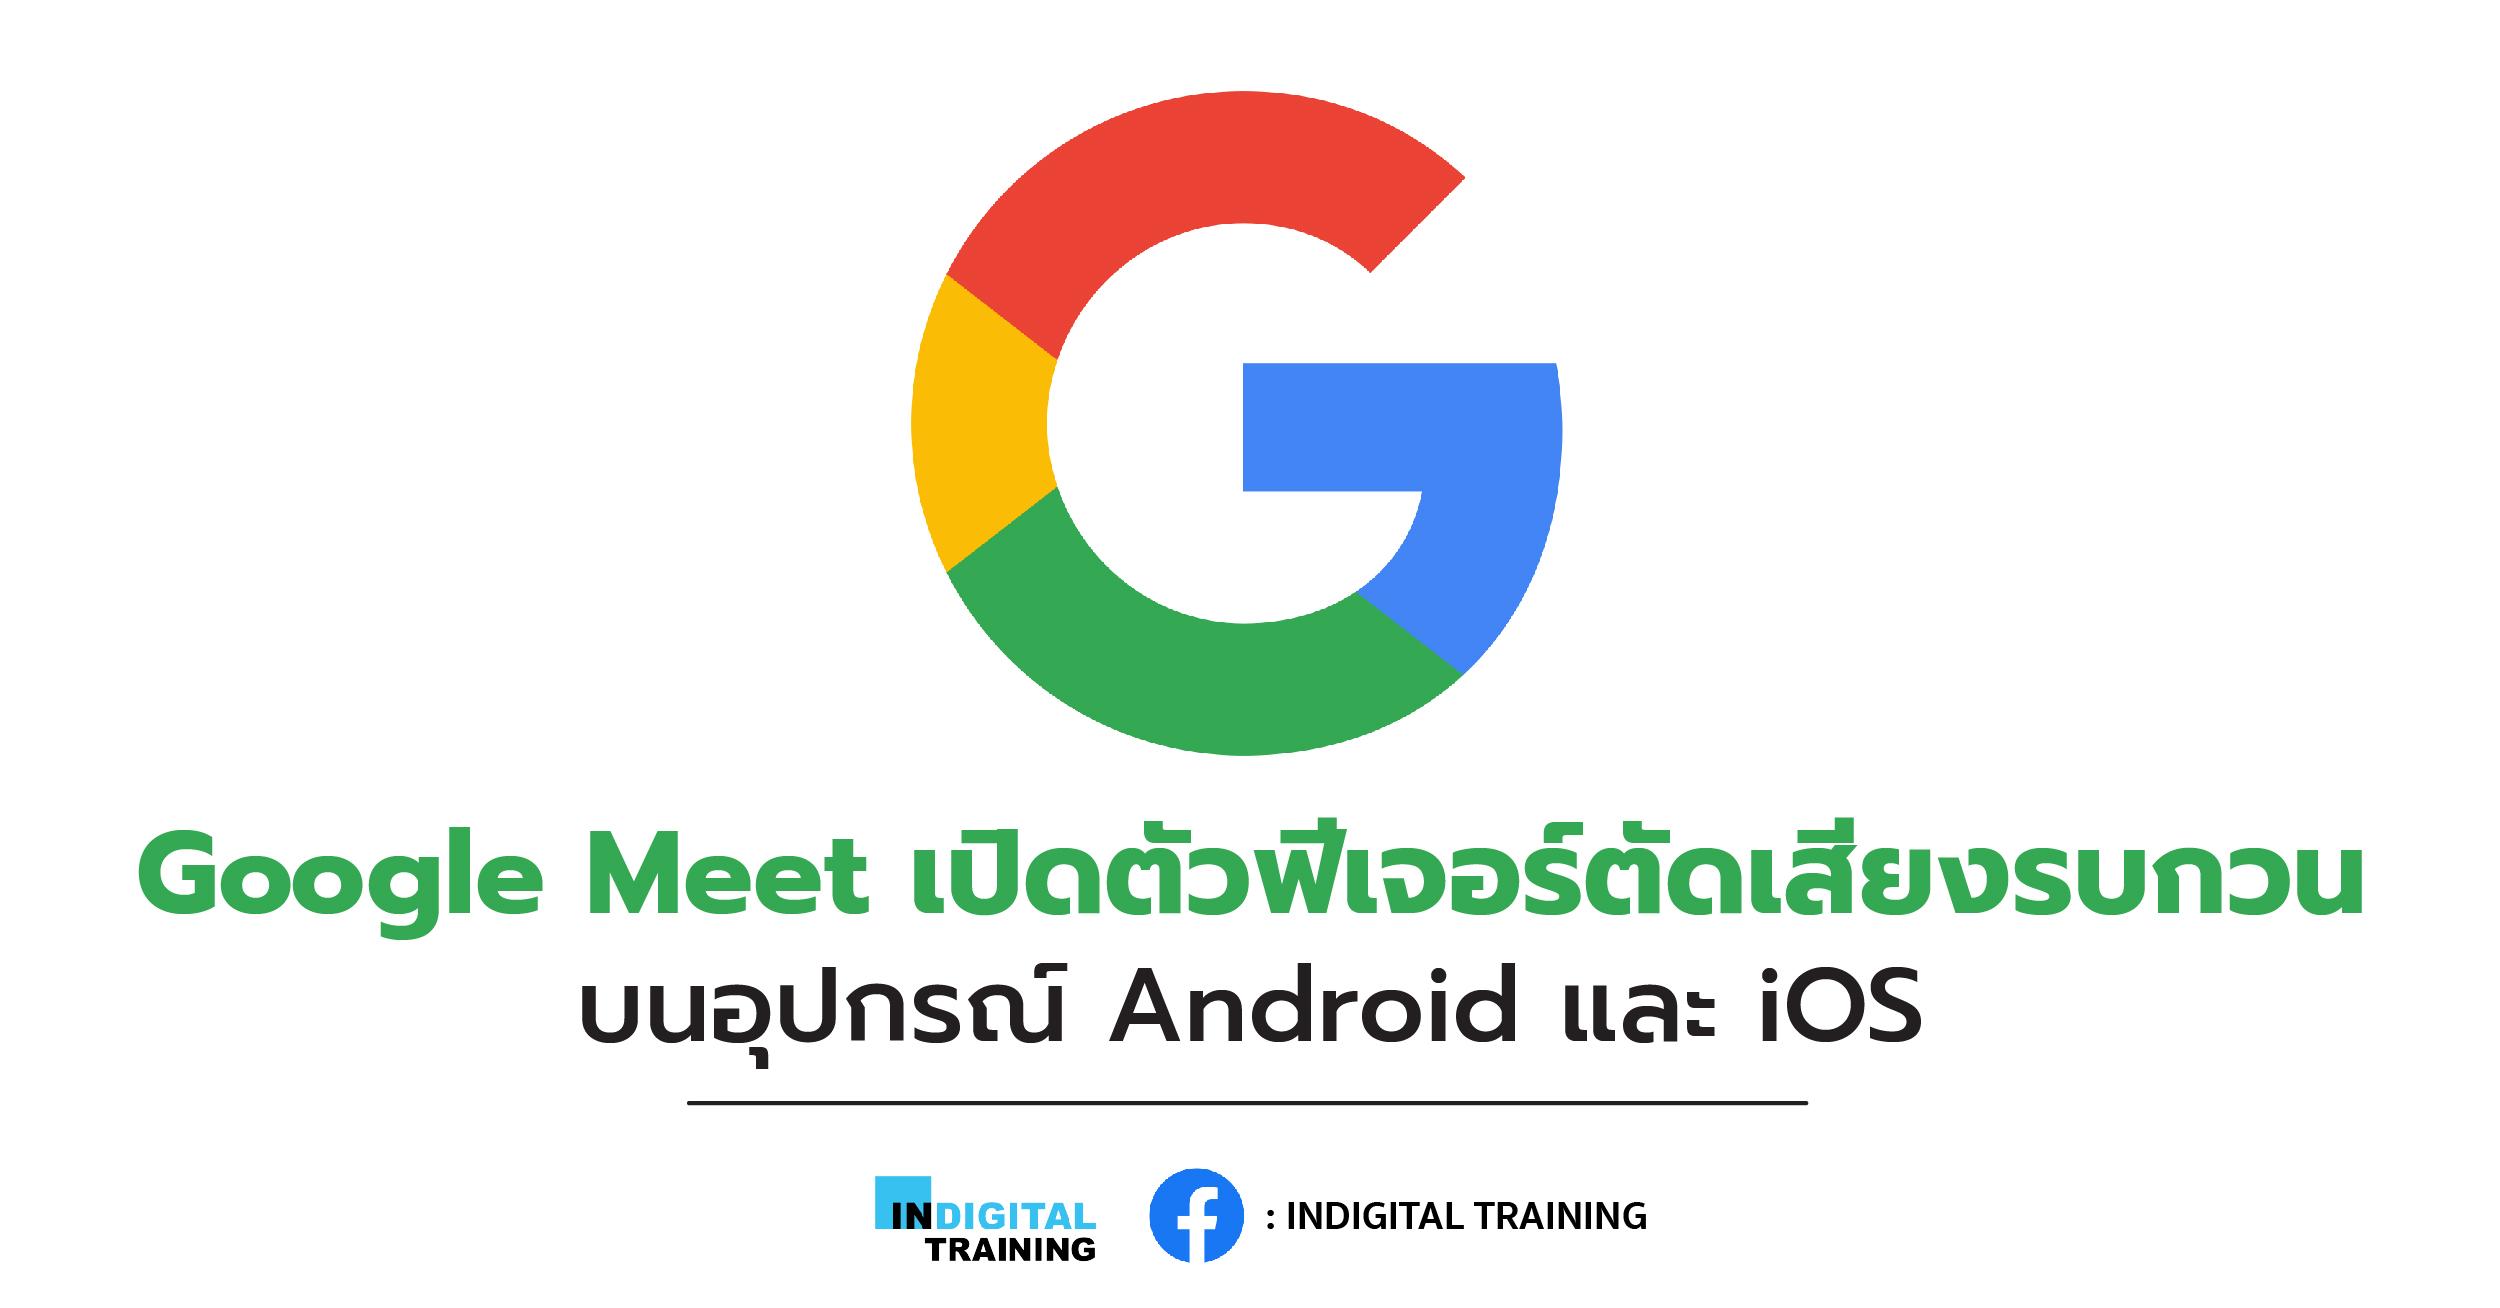 Google Meet เปิดตัวฟีเจอร์ตัดเสียงรบกวนบนอุปกรณ์ Android และ iOS